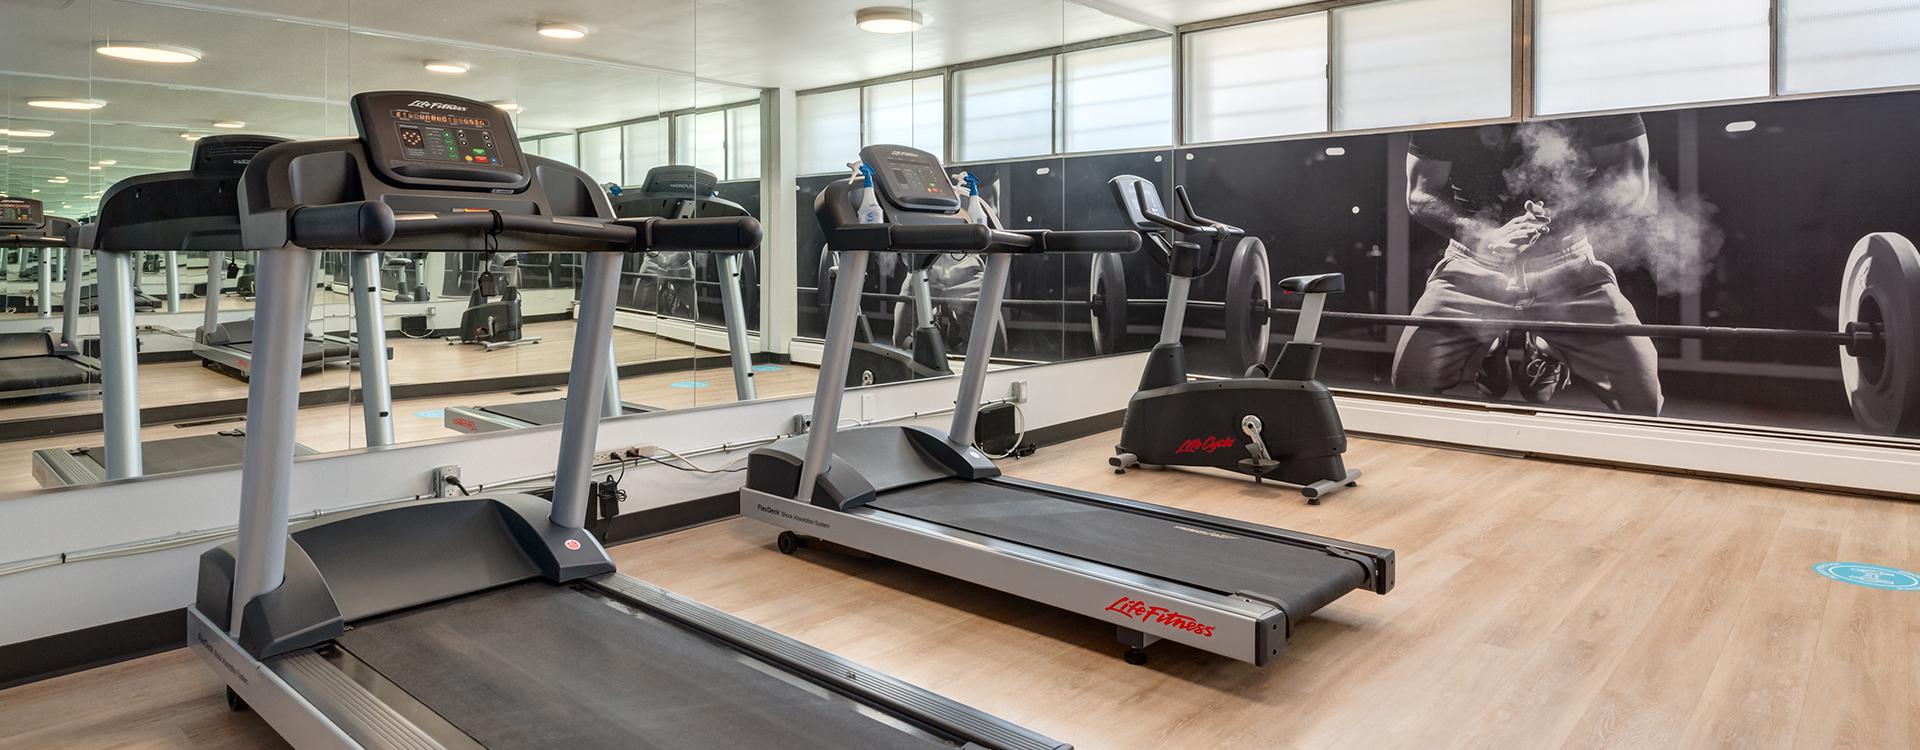 the-lancaster-house-10025-115-street-edmonton-fitness-centre